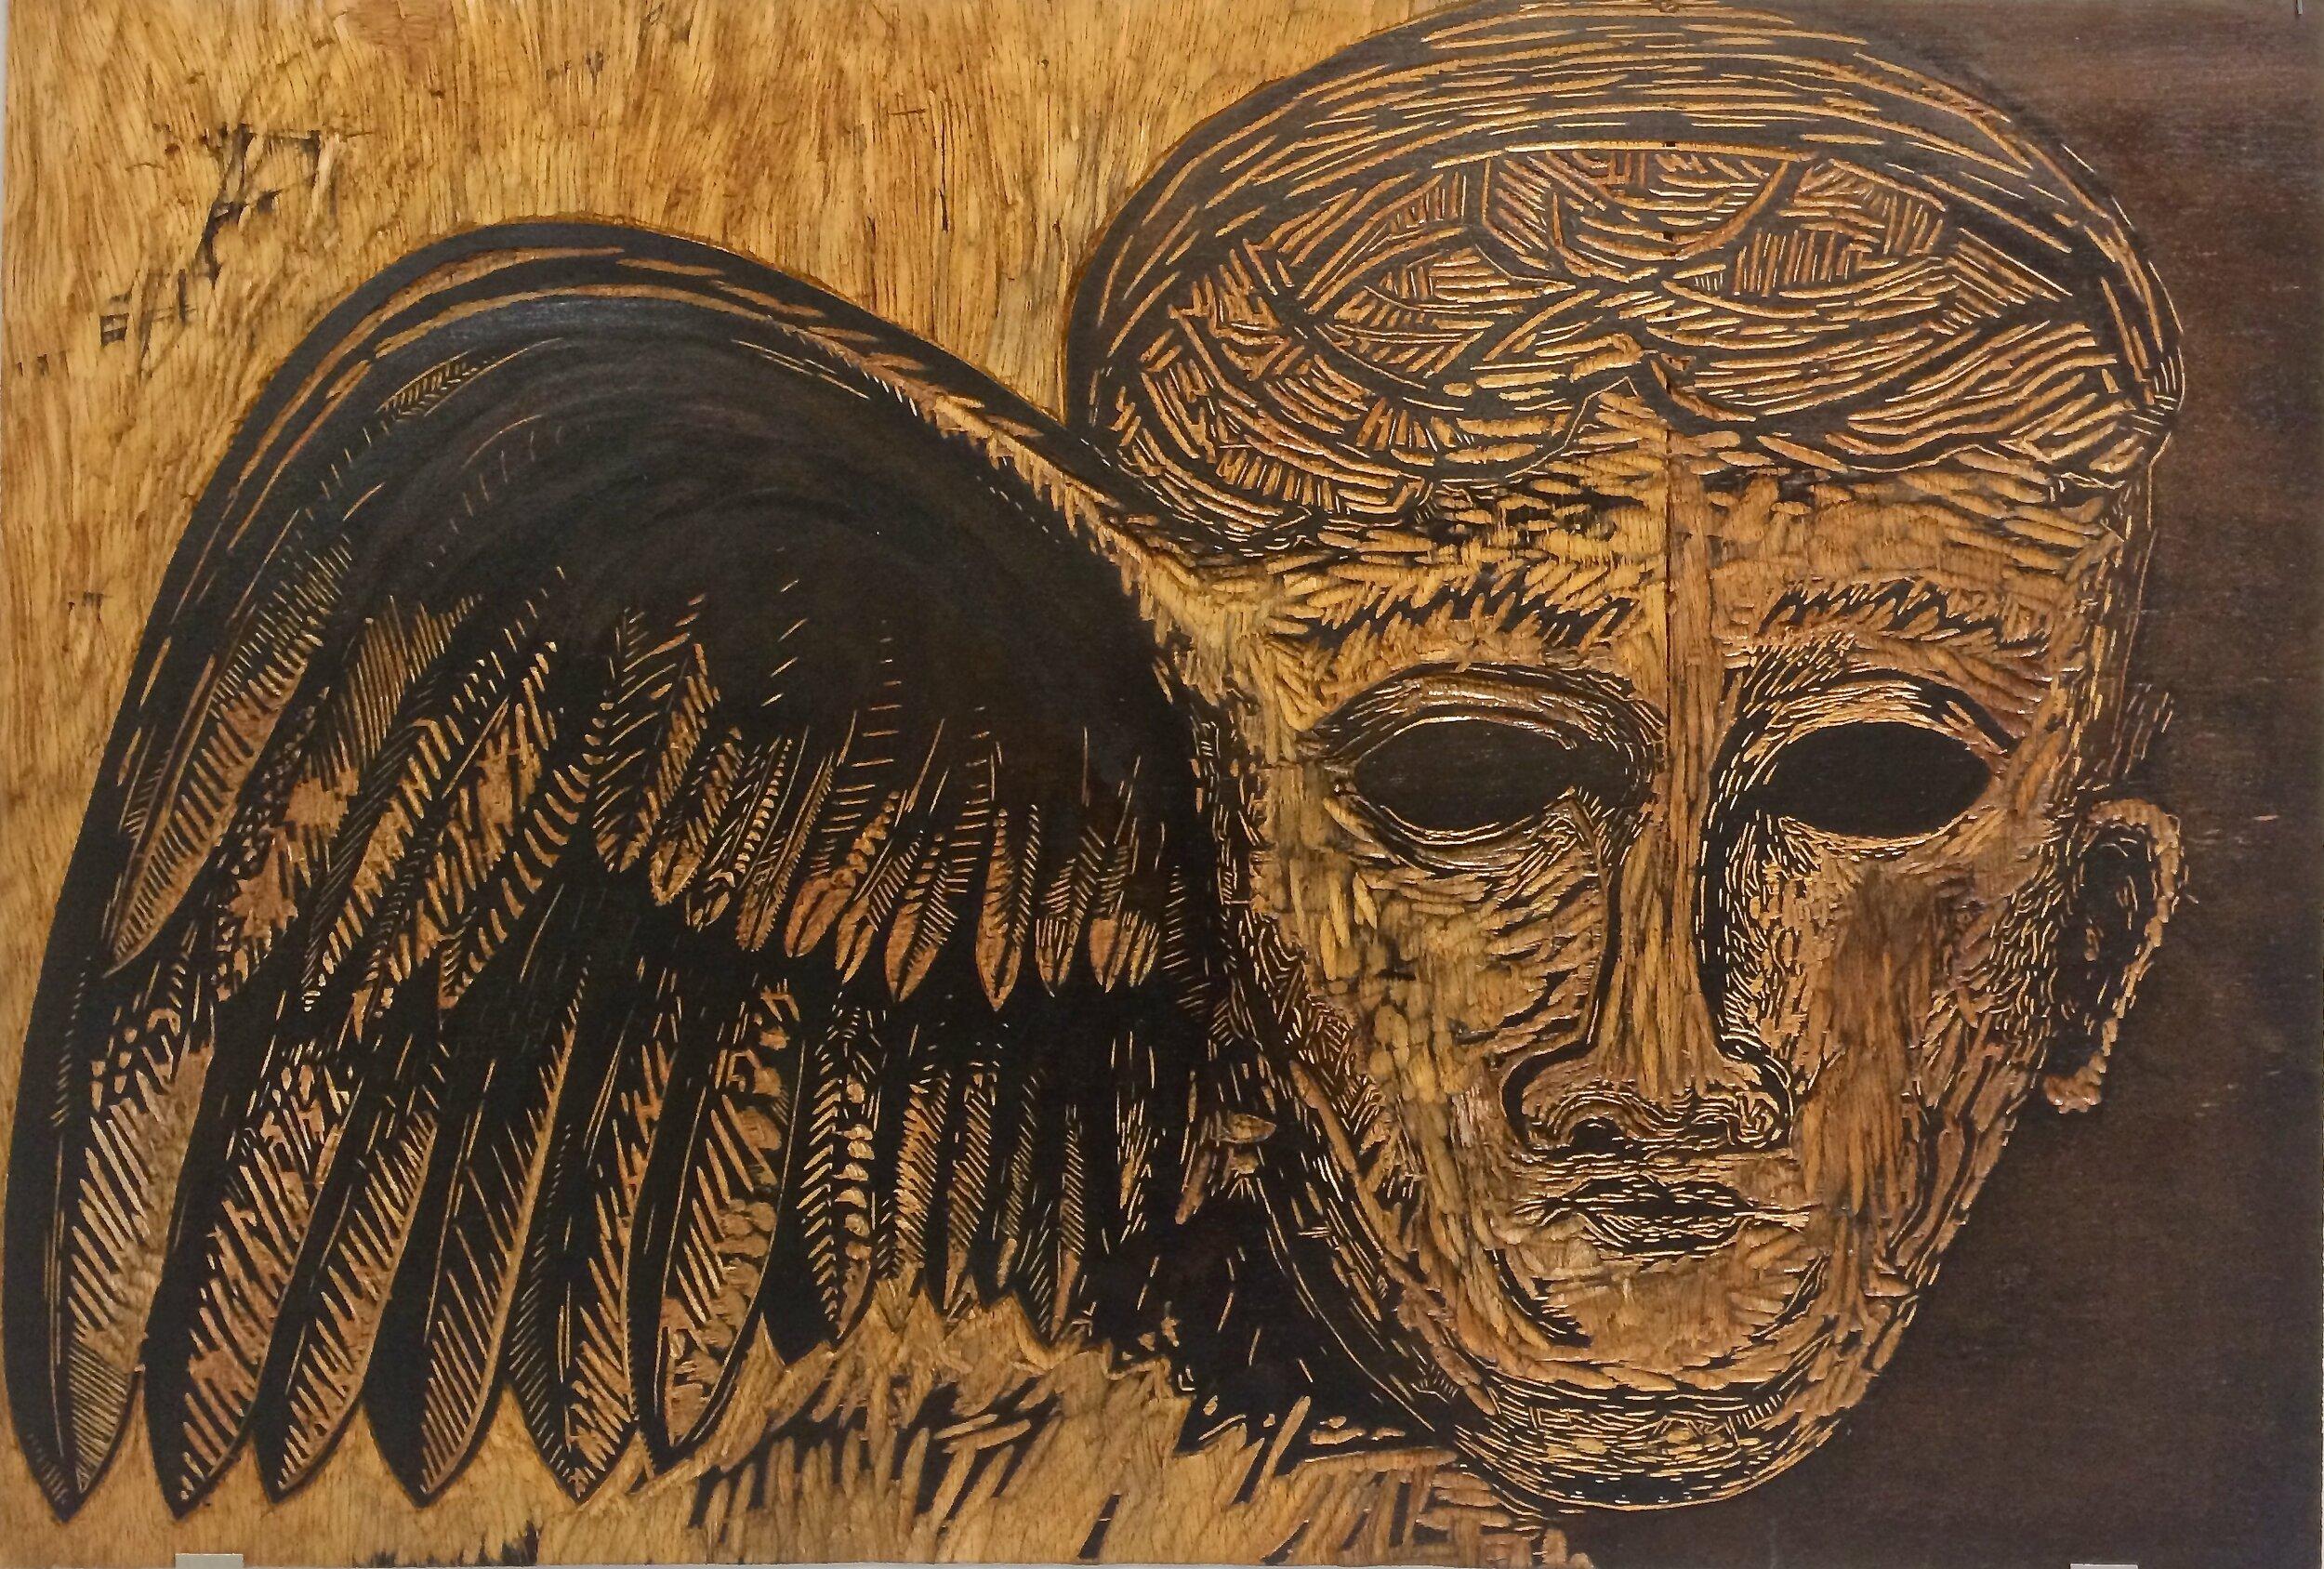 Hypnos, God of Sleep  (2019), woodcut block, David Wolfe